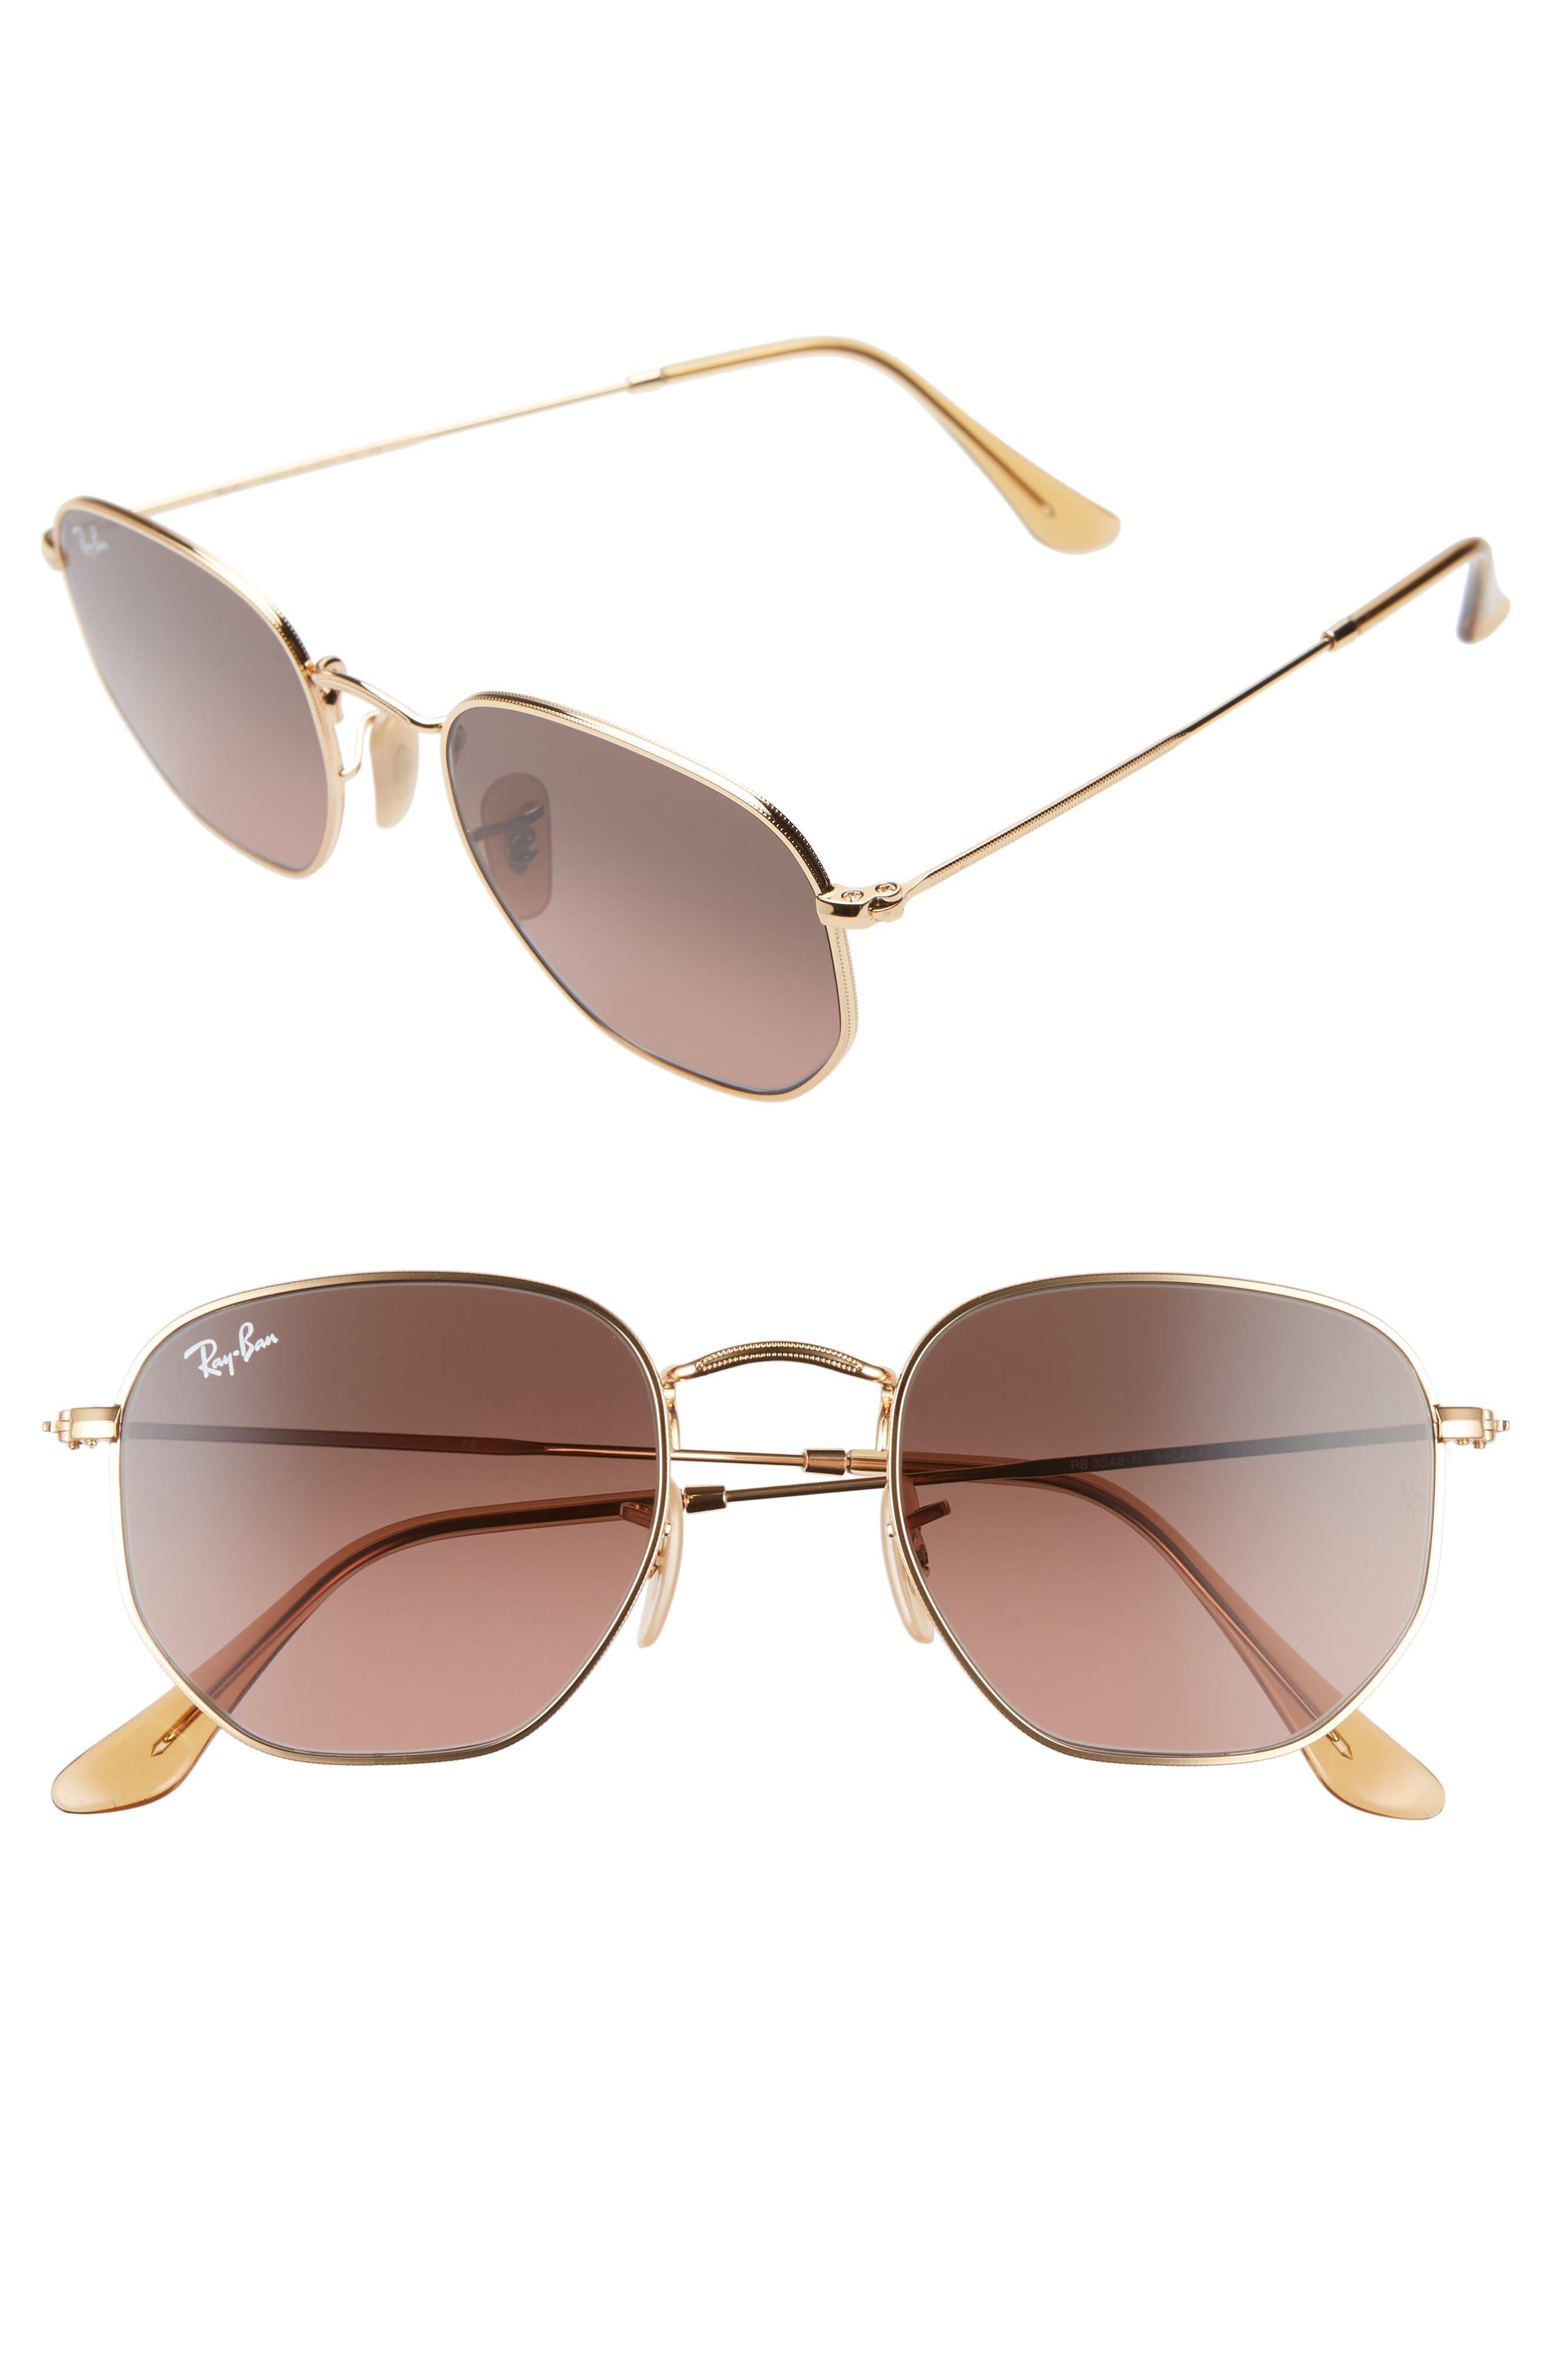 Ray-Ban 51Mm Aviator Sunglasses - Gold/ Brown Gradient